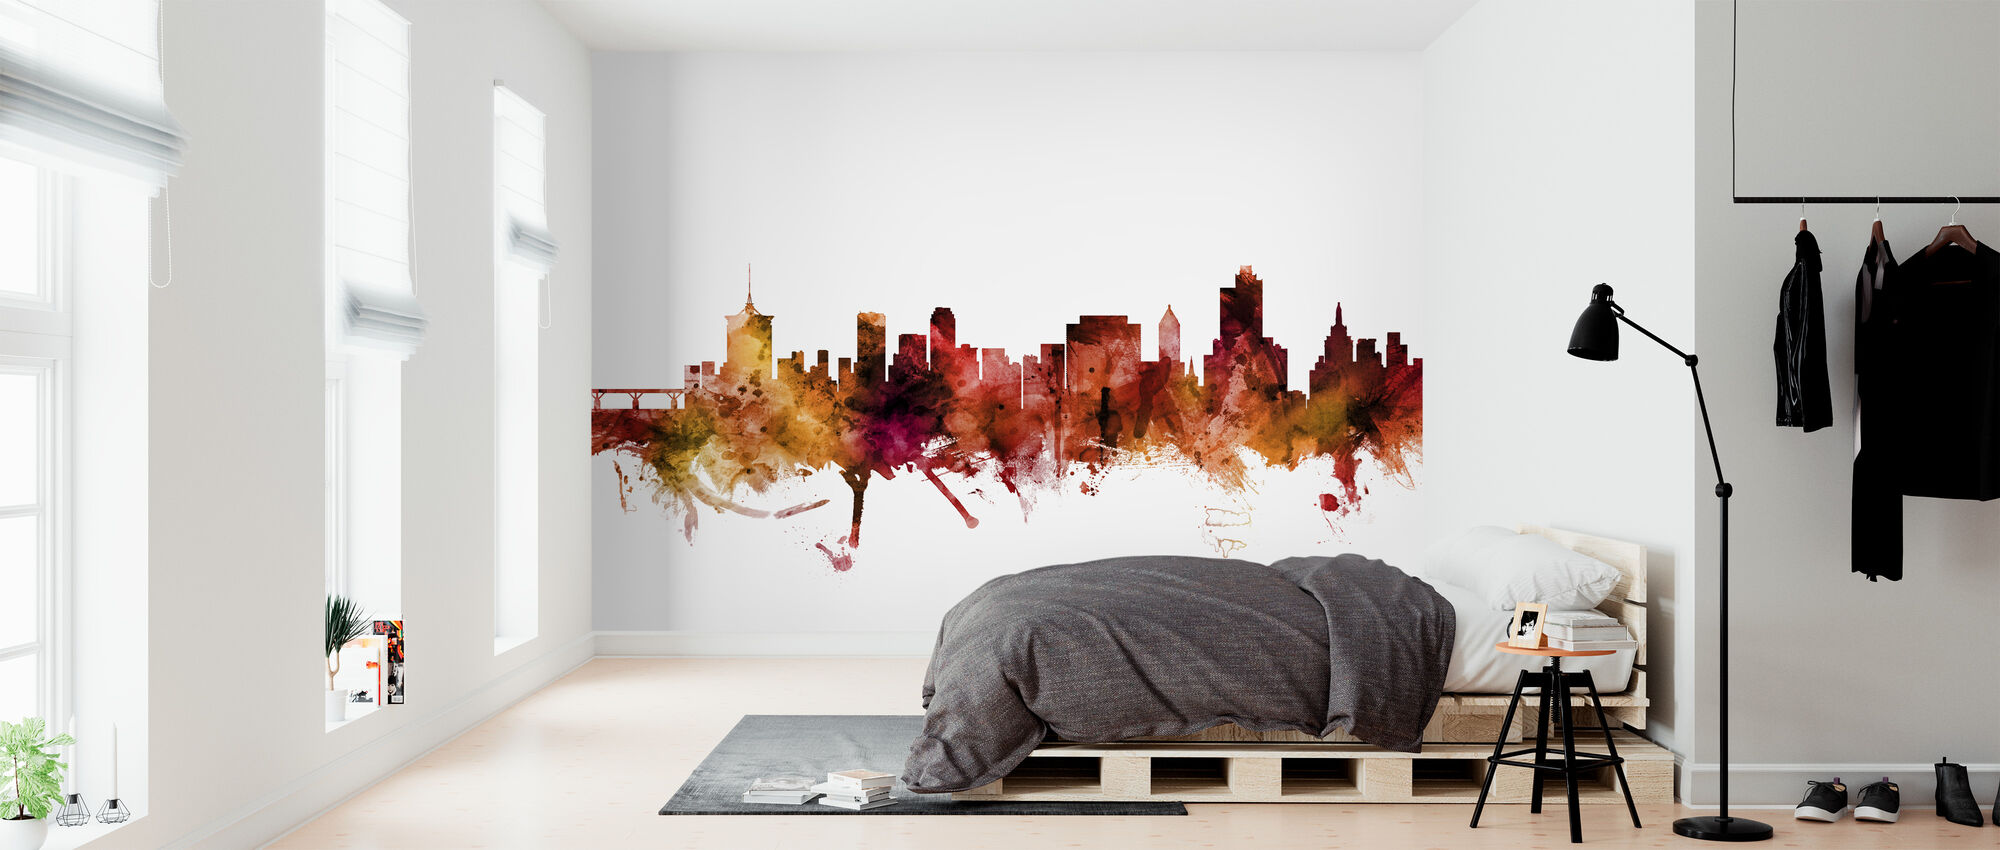 Tulsa Oklahoma Skyline - Wallpaper - Bedroom